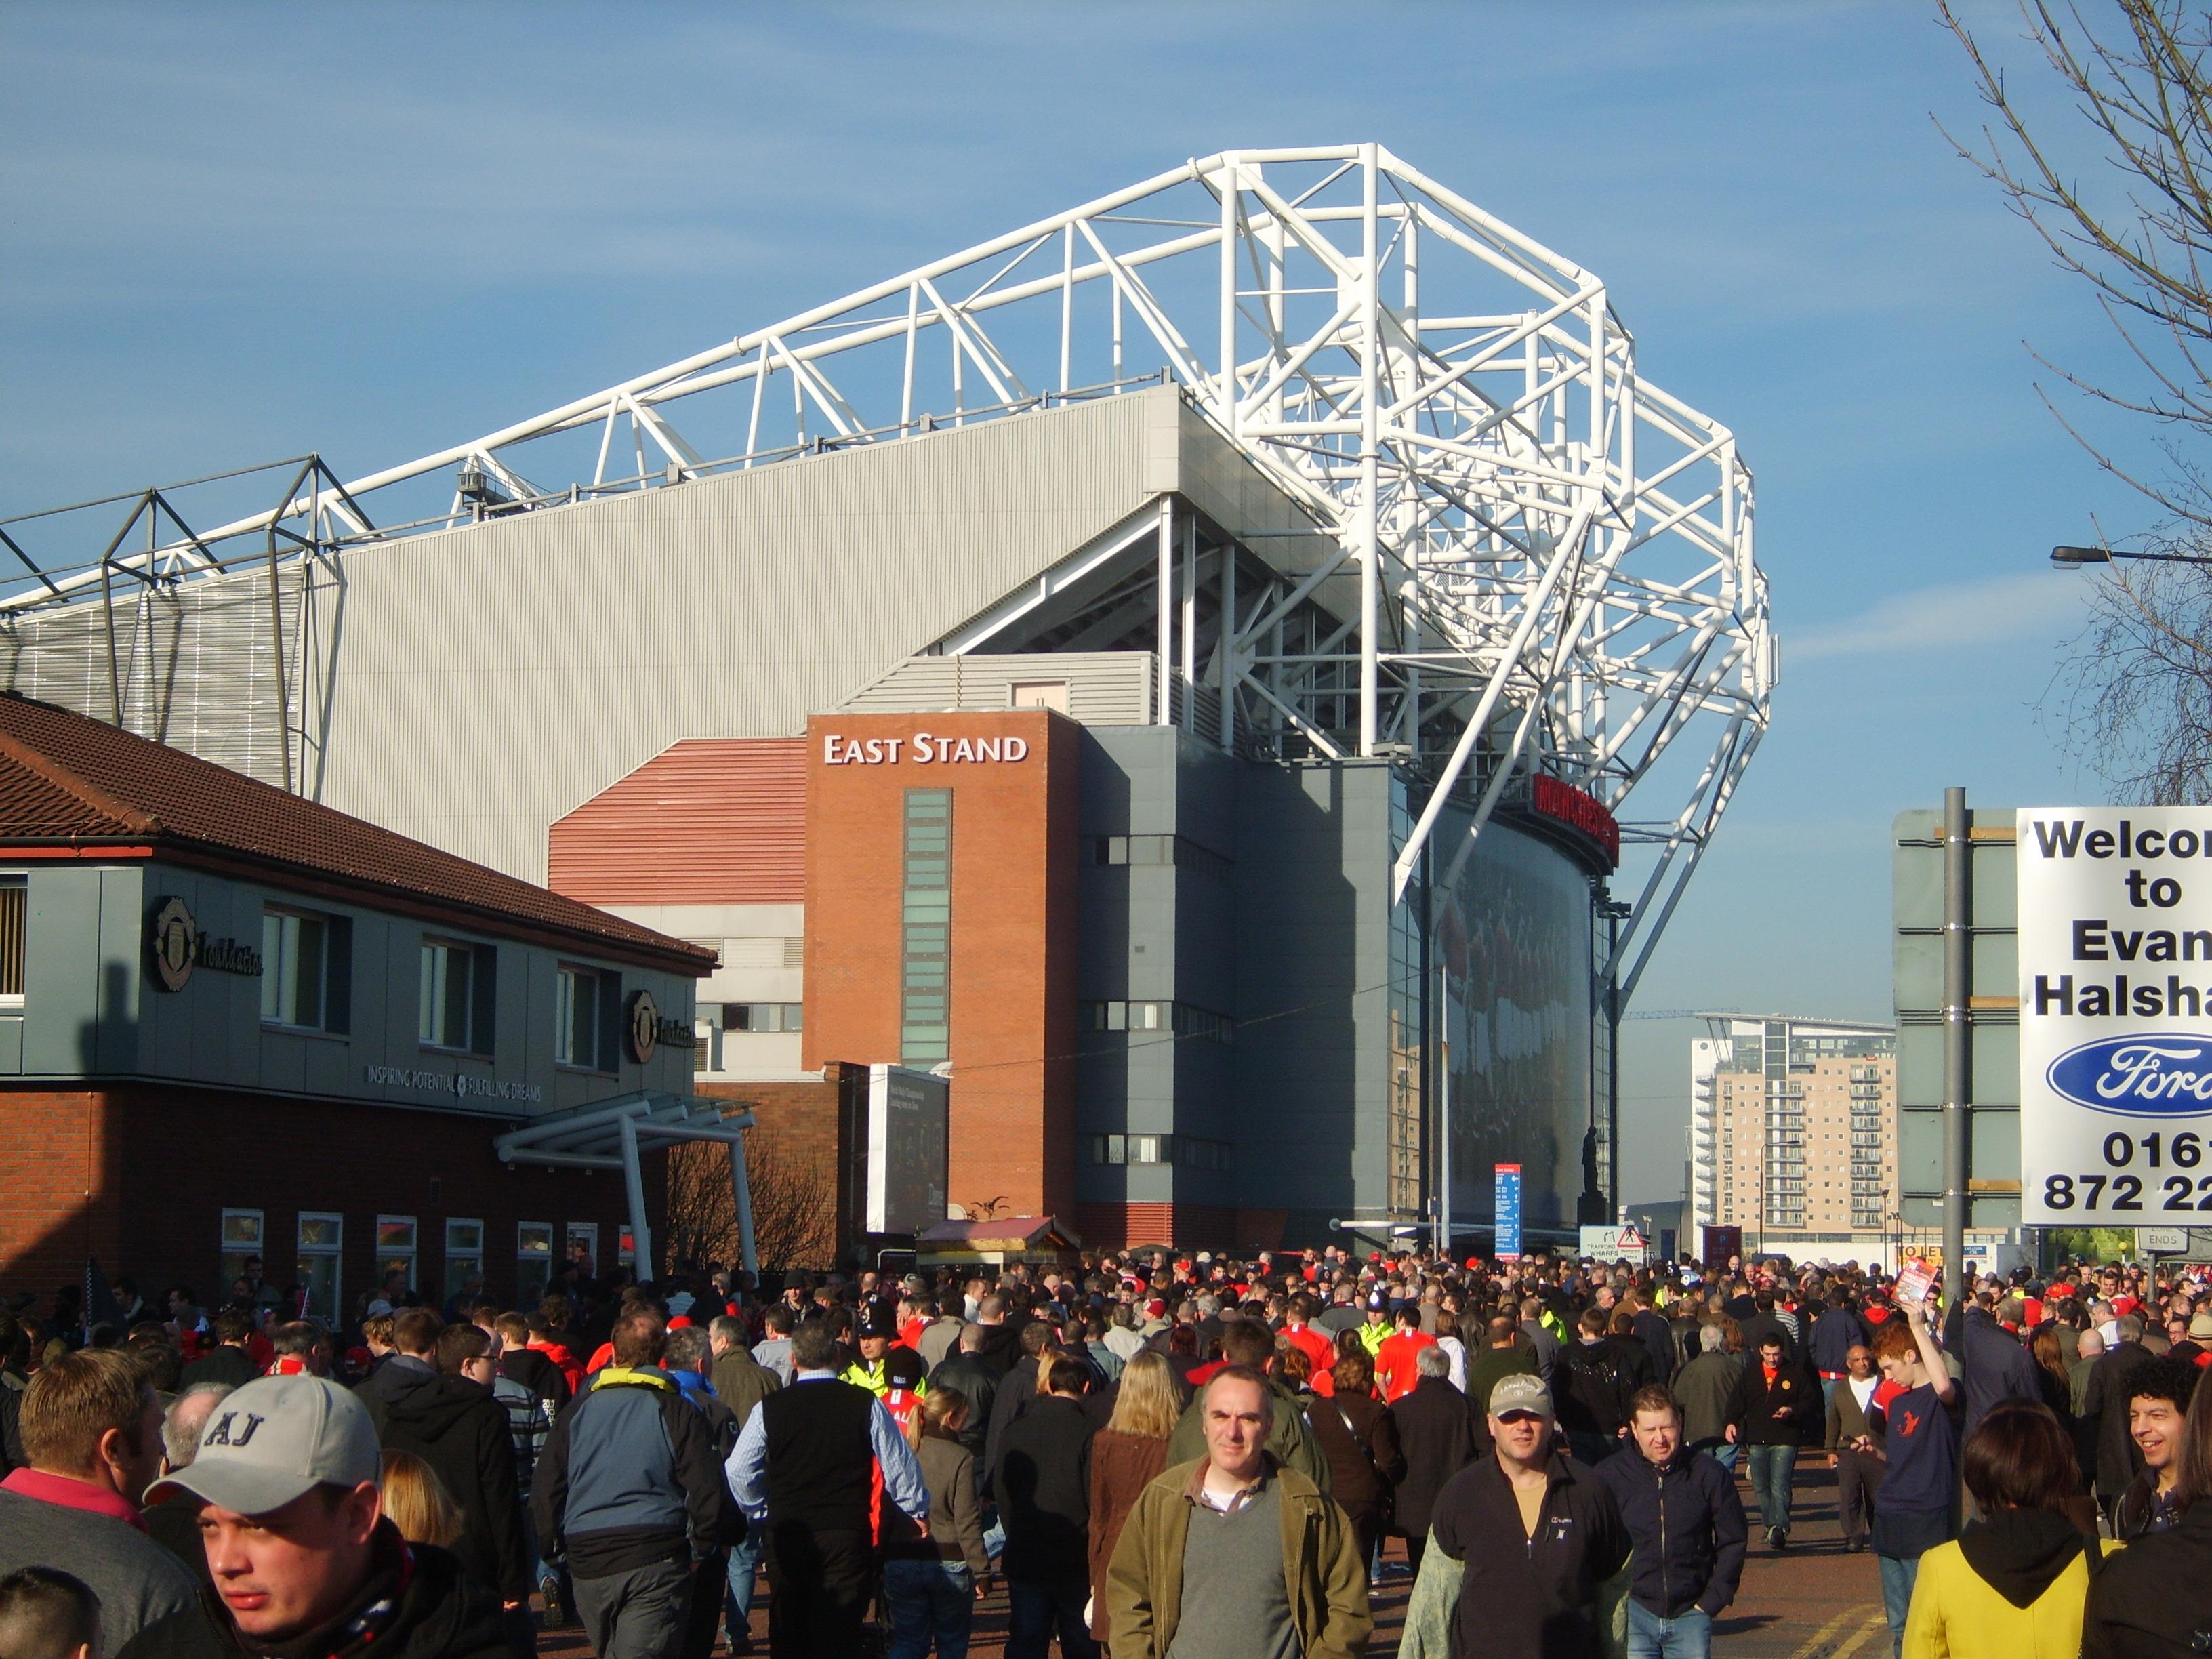 Ole Gunnar Solskjaer's Manchester United